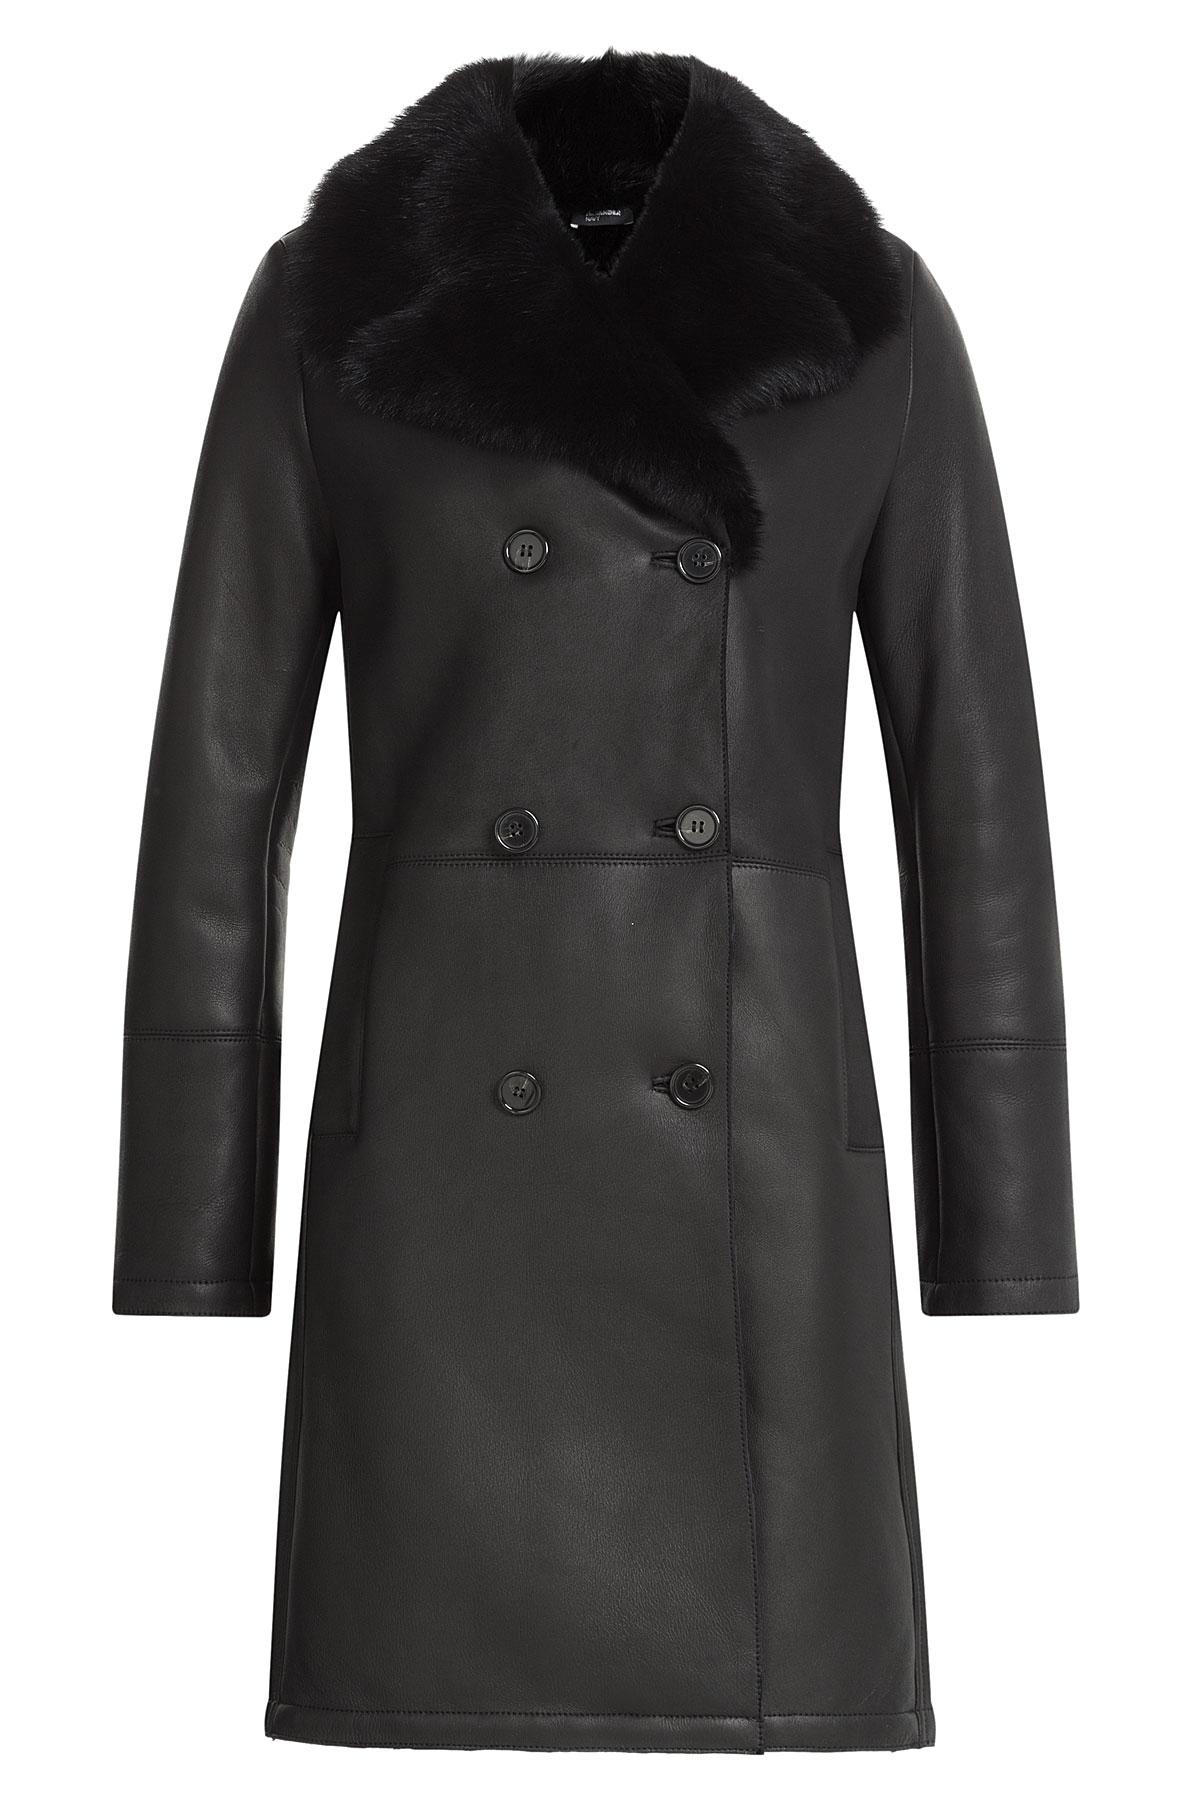 Jil sander navy Lamb Leather And Shearling Coat - Black in Black